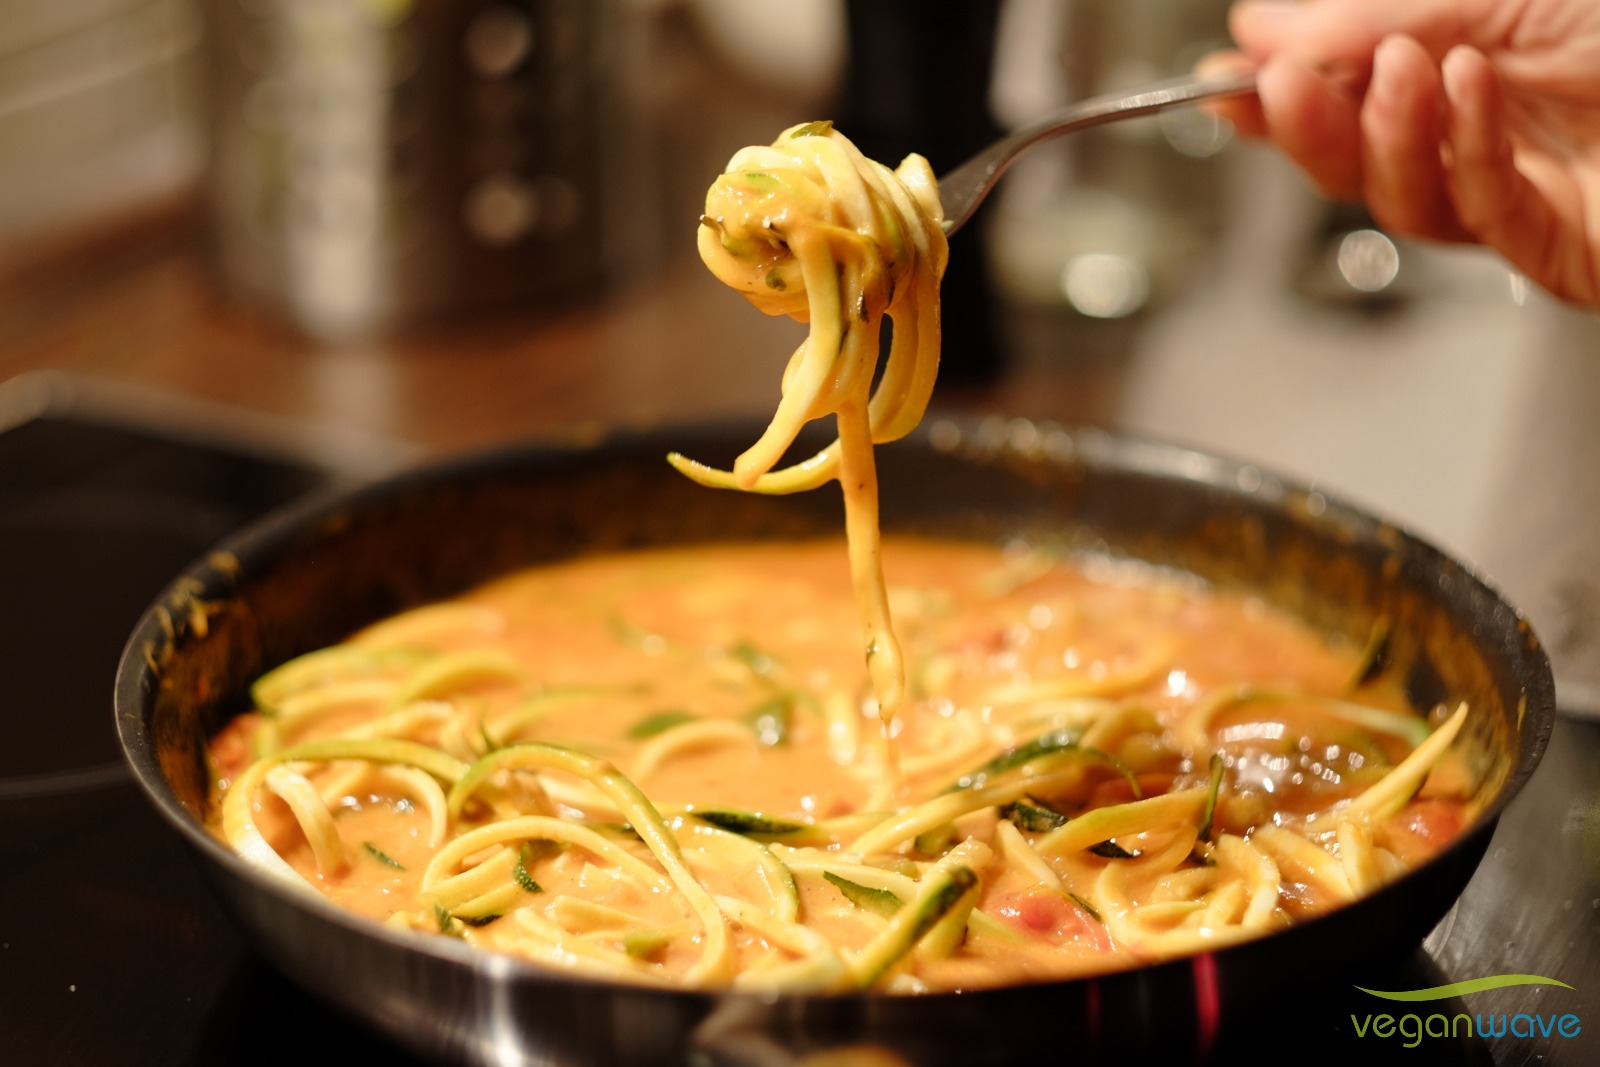 Creamy Zucchinispaghetti